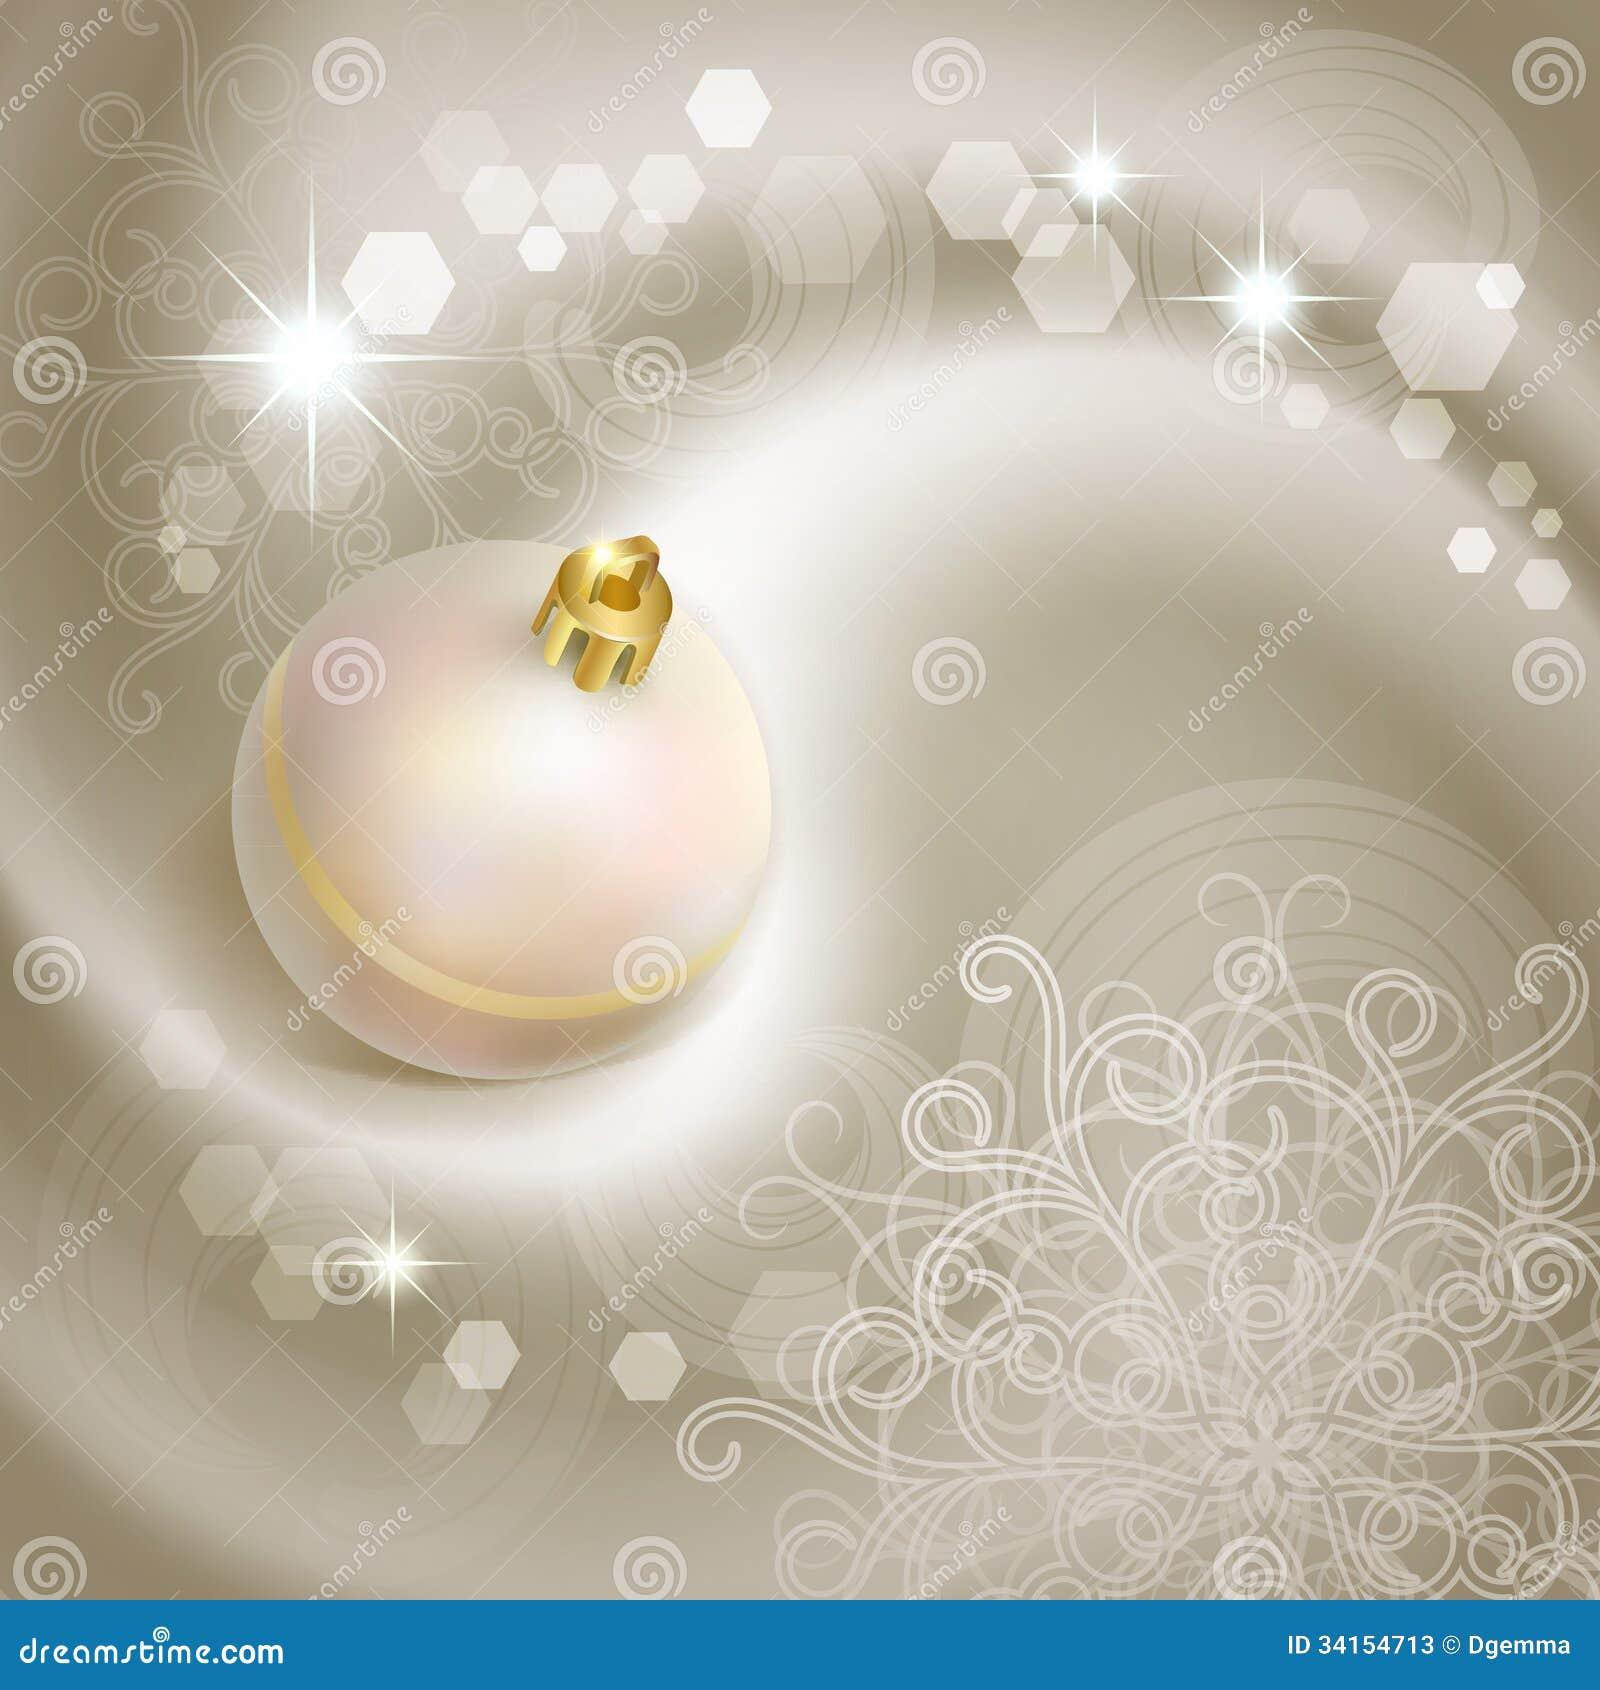 christmas background with pearl christmas tree ball - The Christmas Pearl